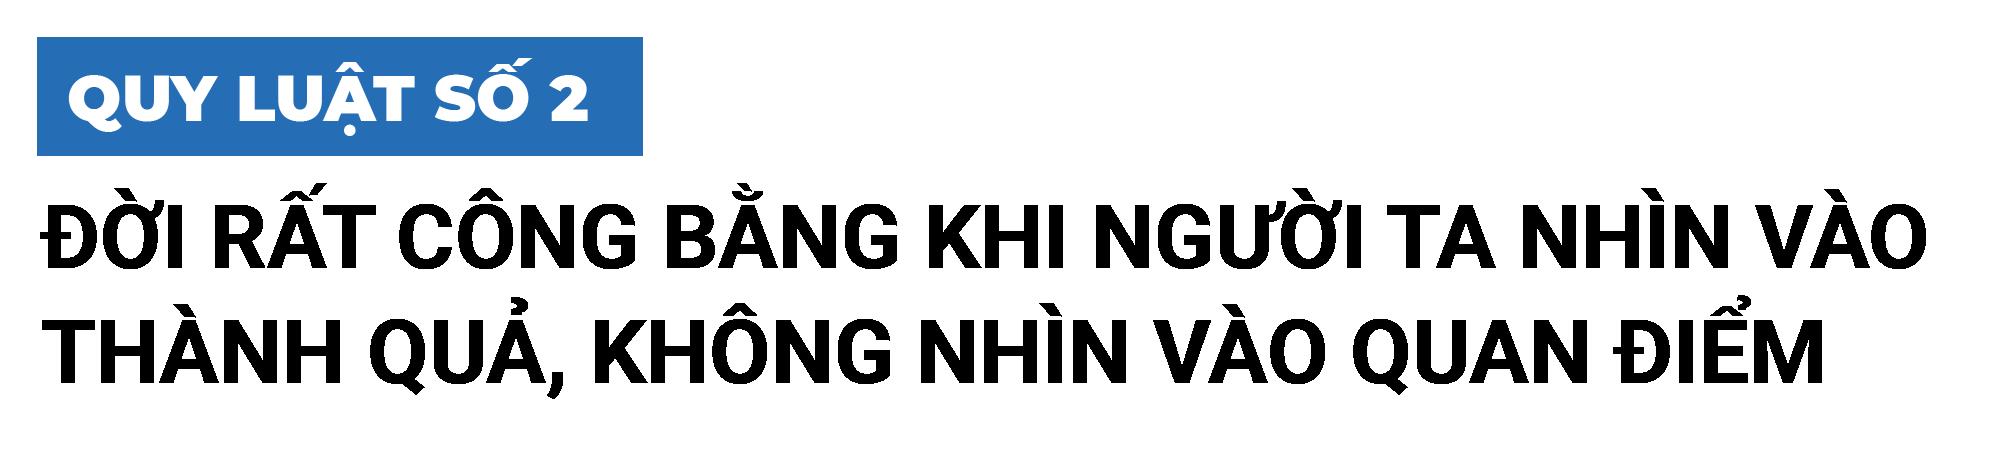 bi-quyet-thanh-cong-3